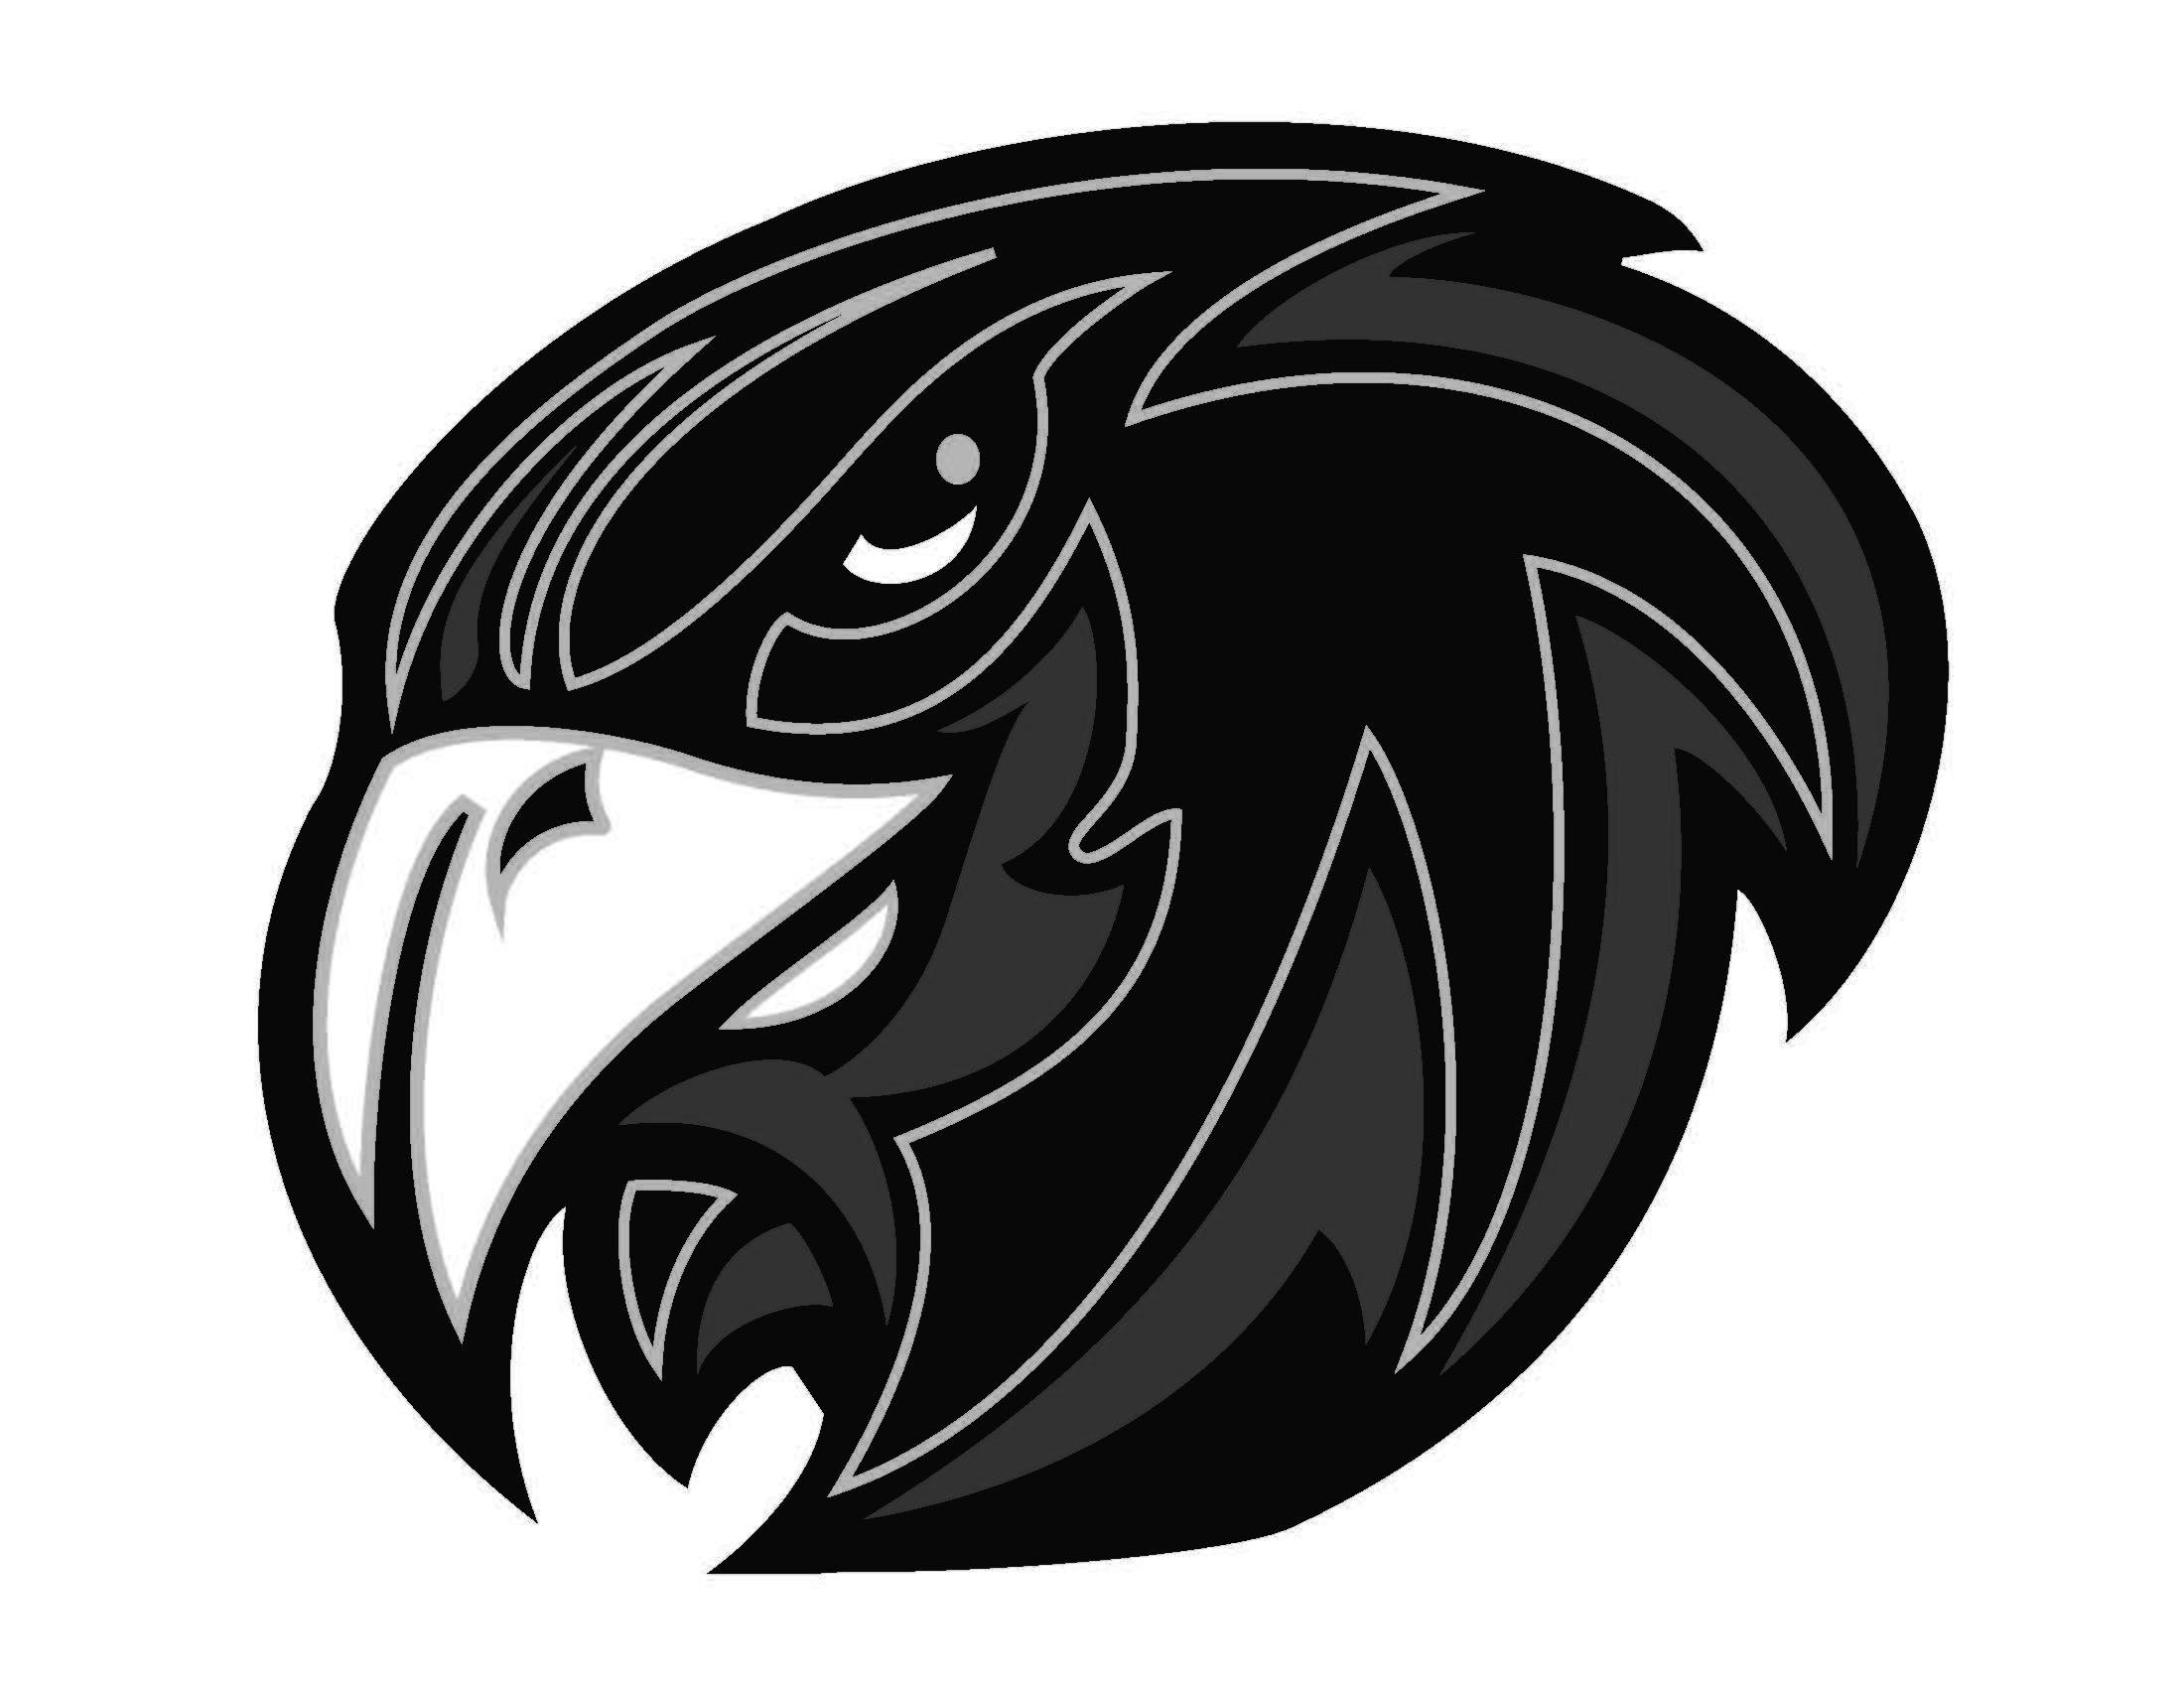 Hawk logo clipart jpg library stock Top Hawk Head Logo Vector Images » Free Vector Art, Images, Graphics ... jpg library stock